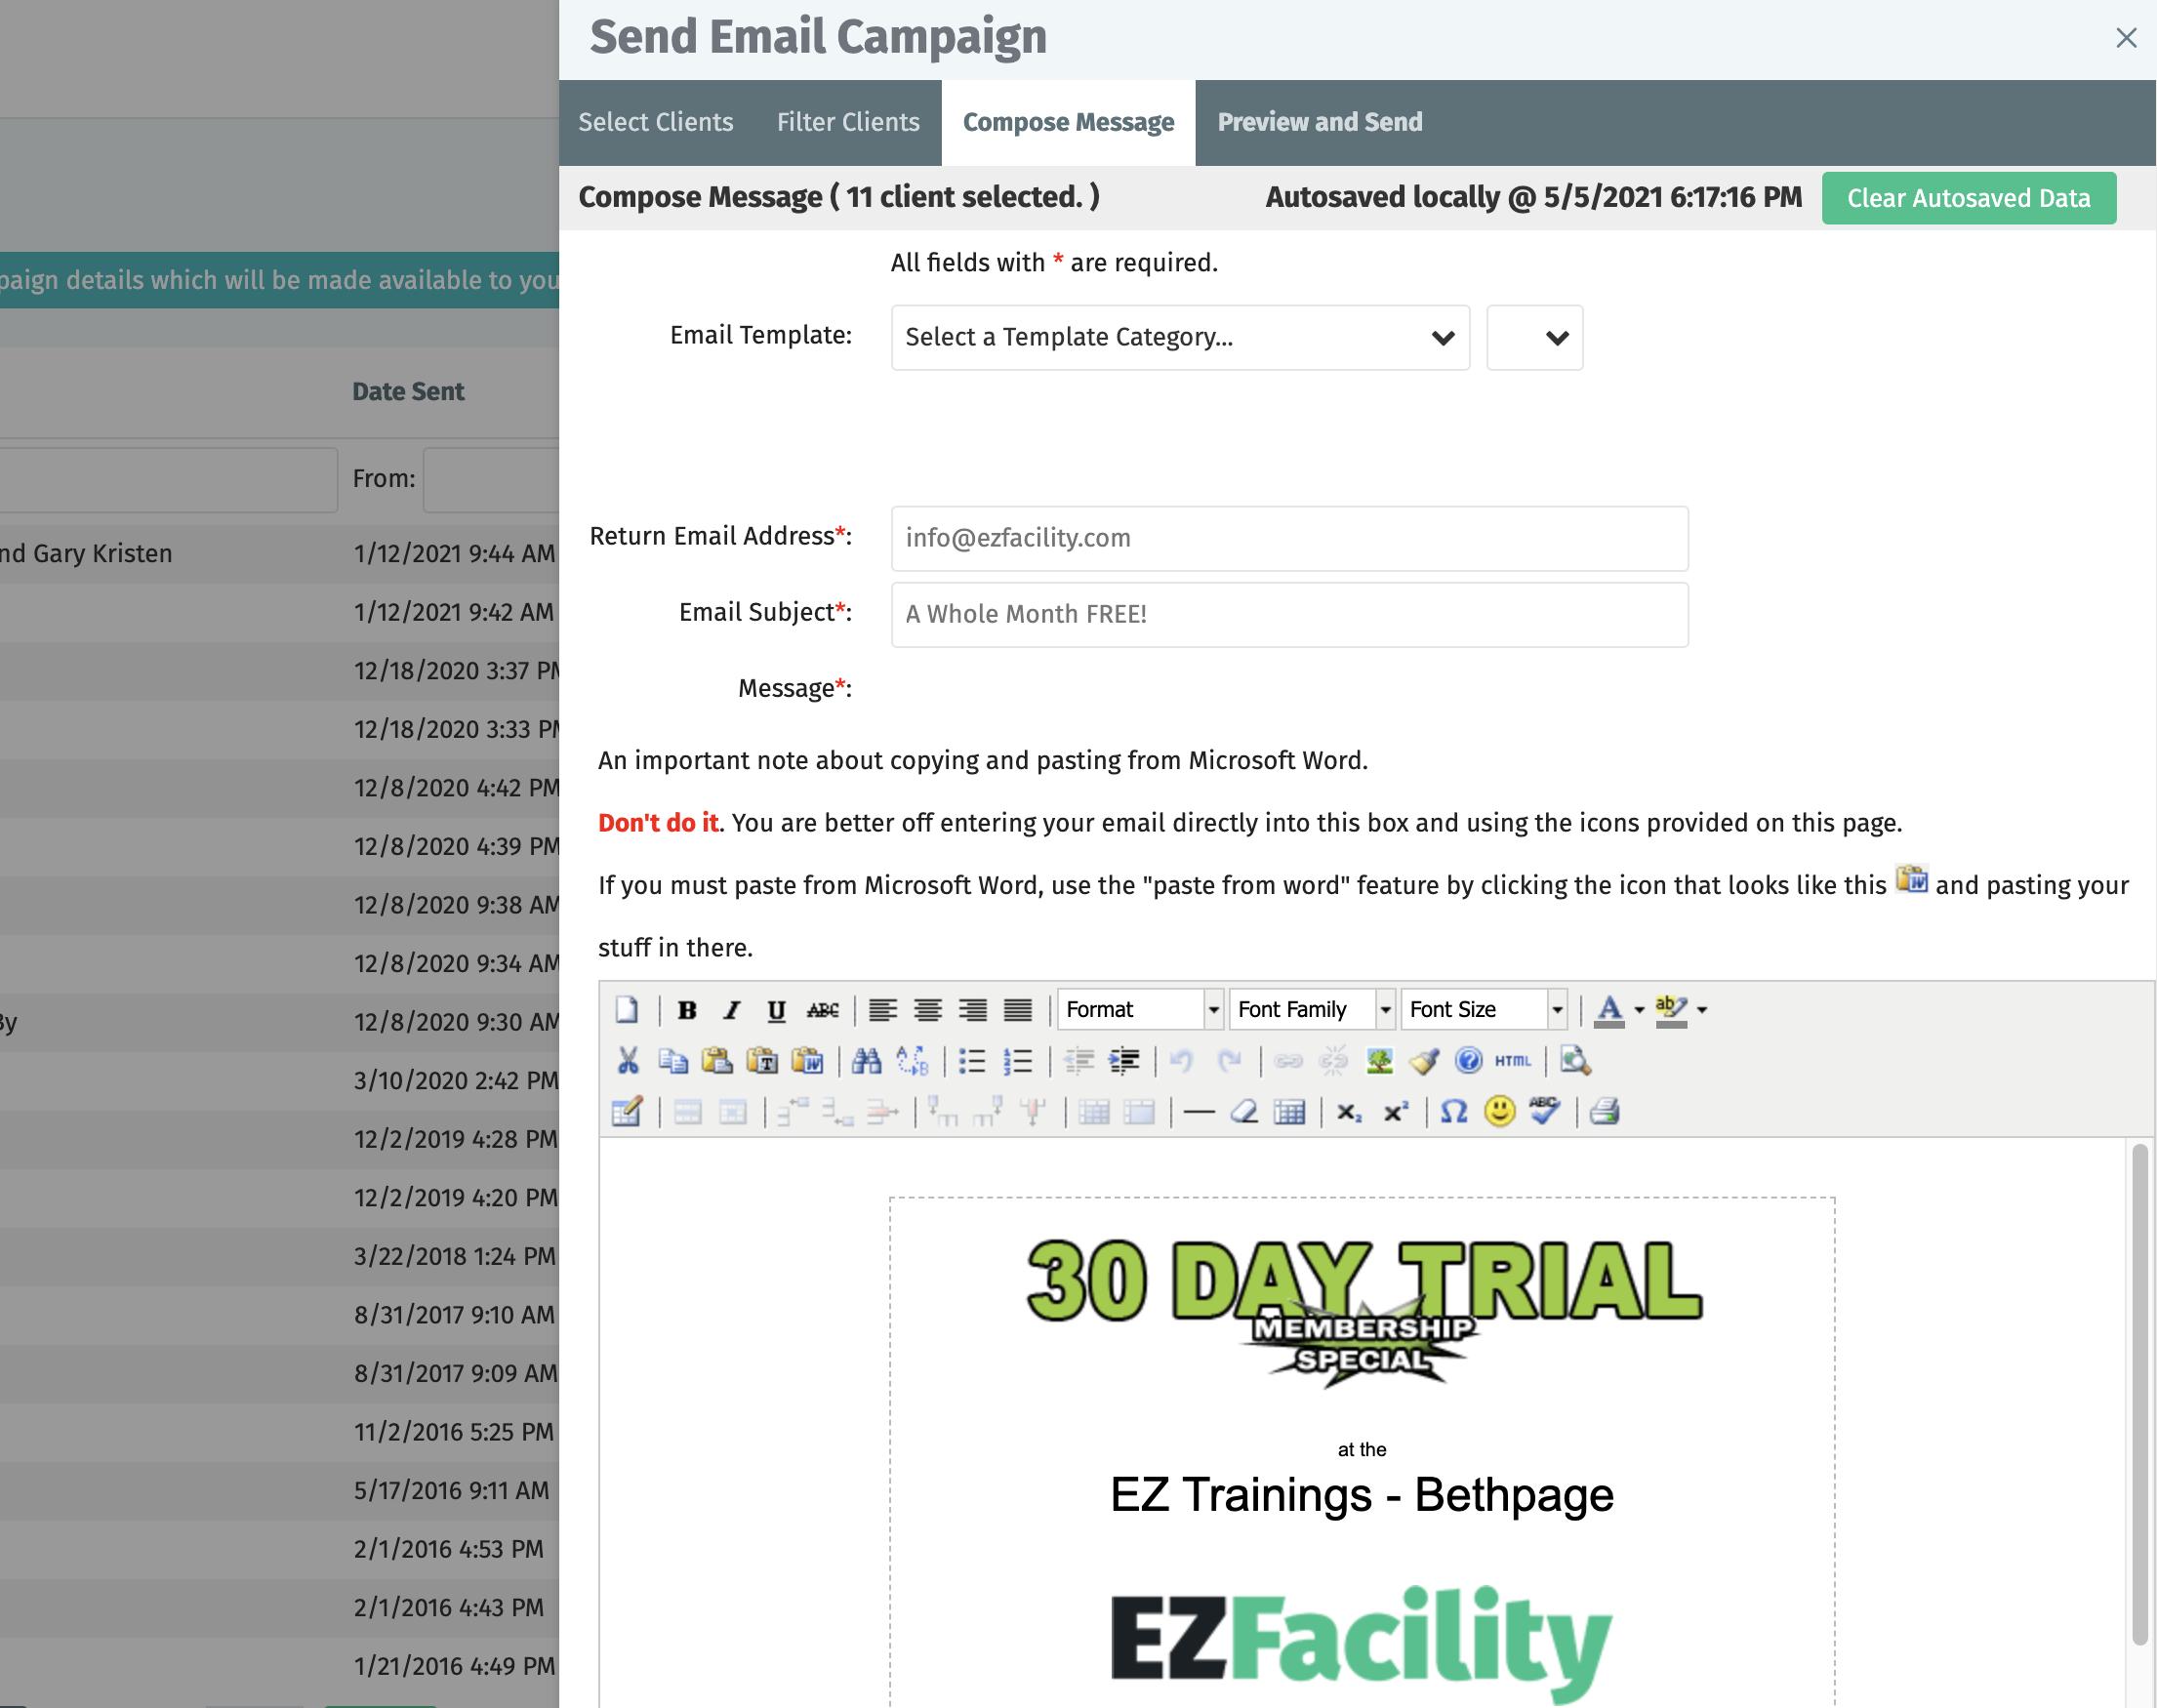 EZFacility marketing campaigns